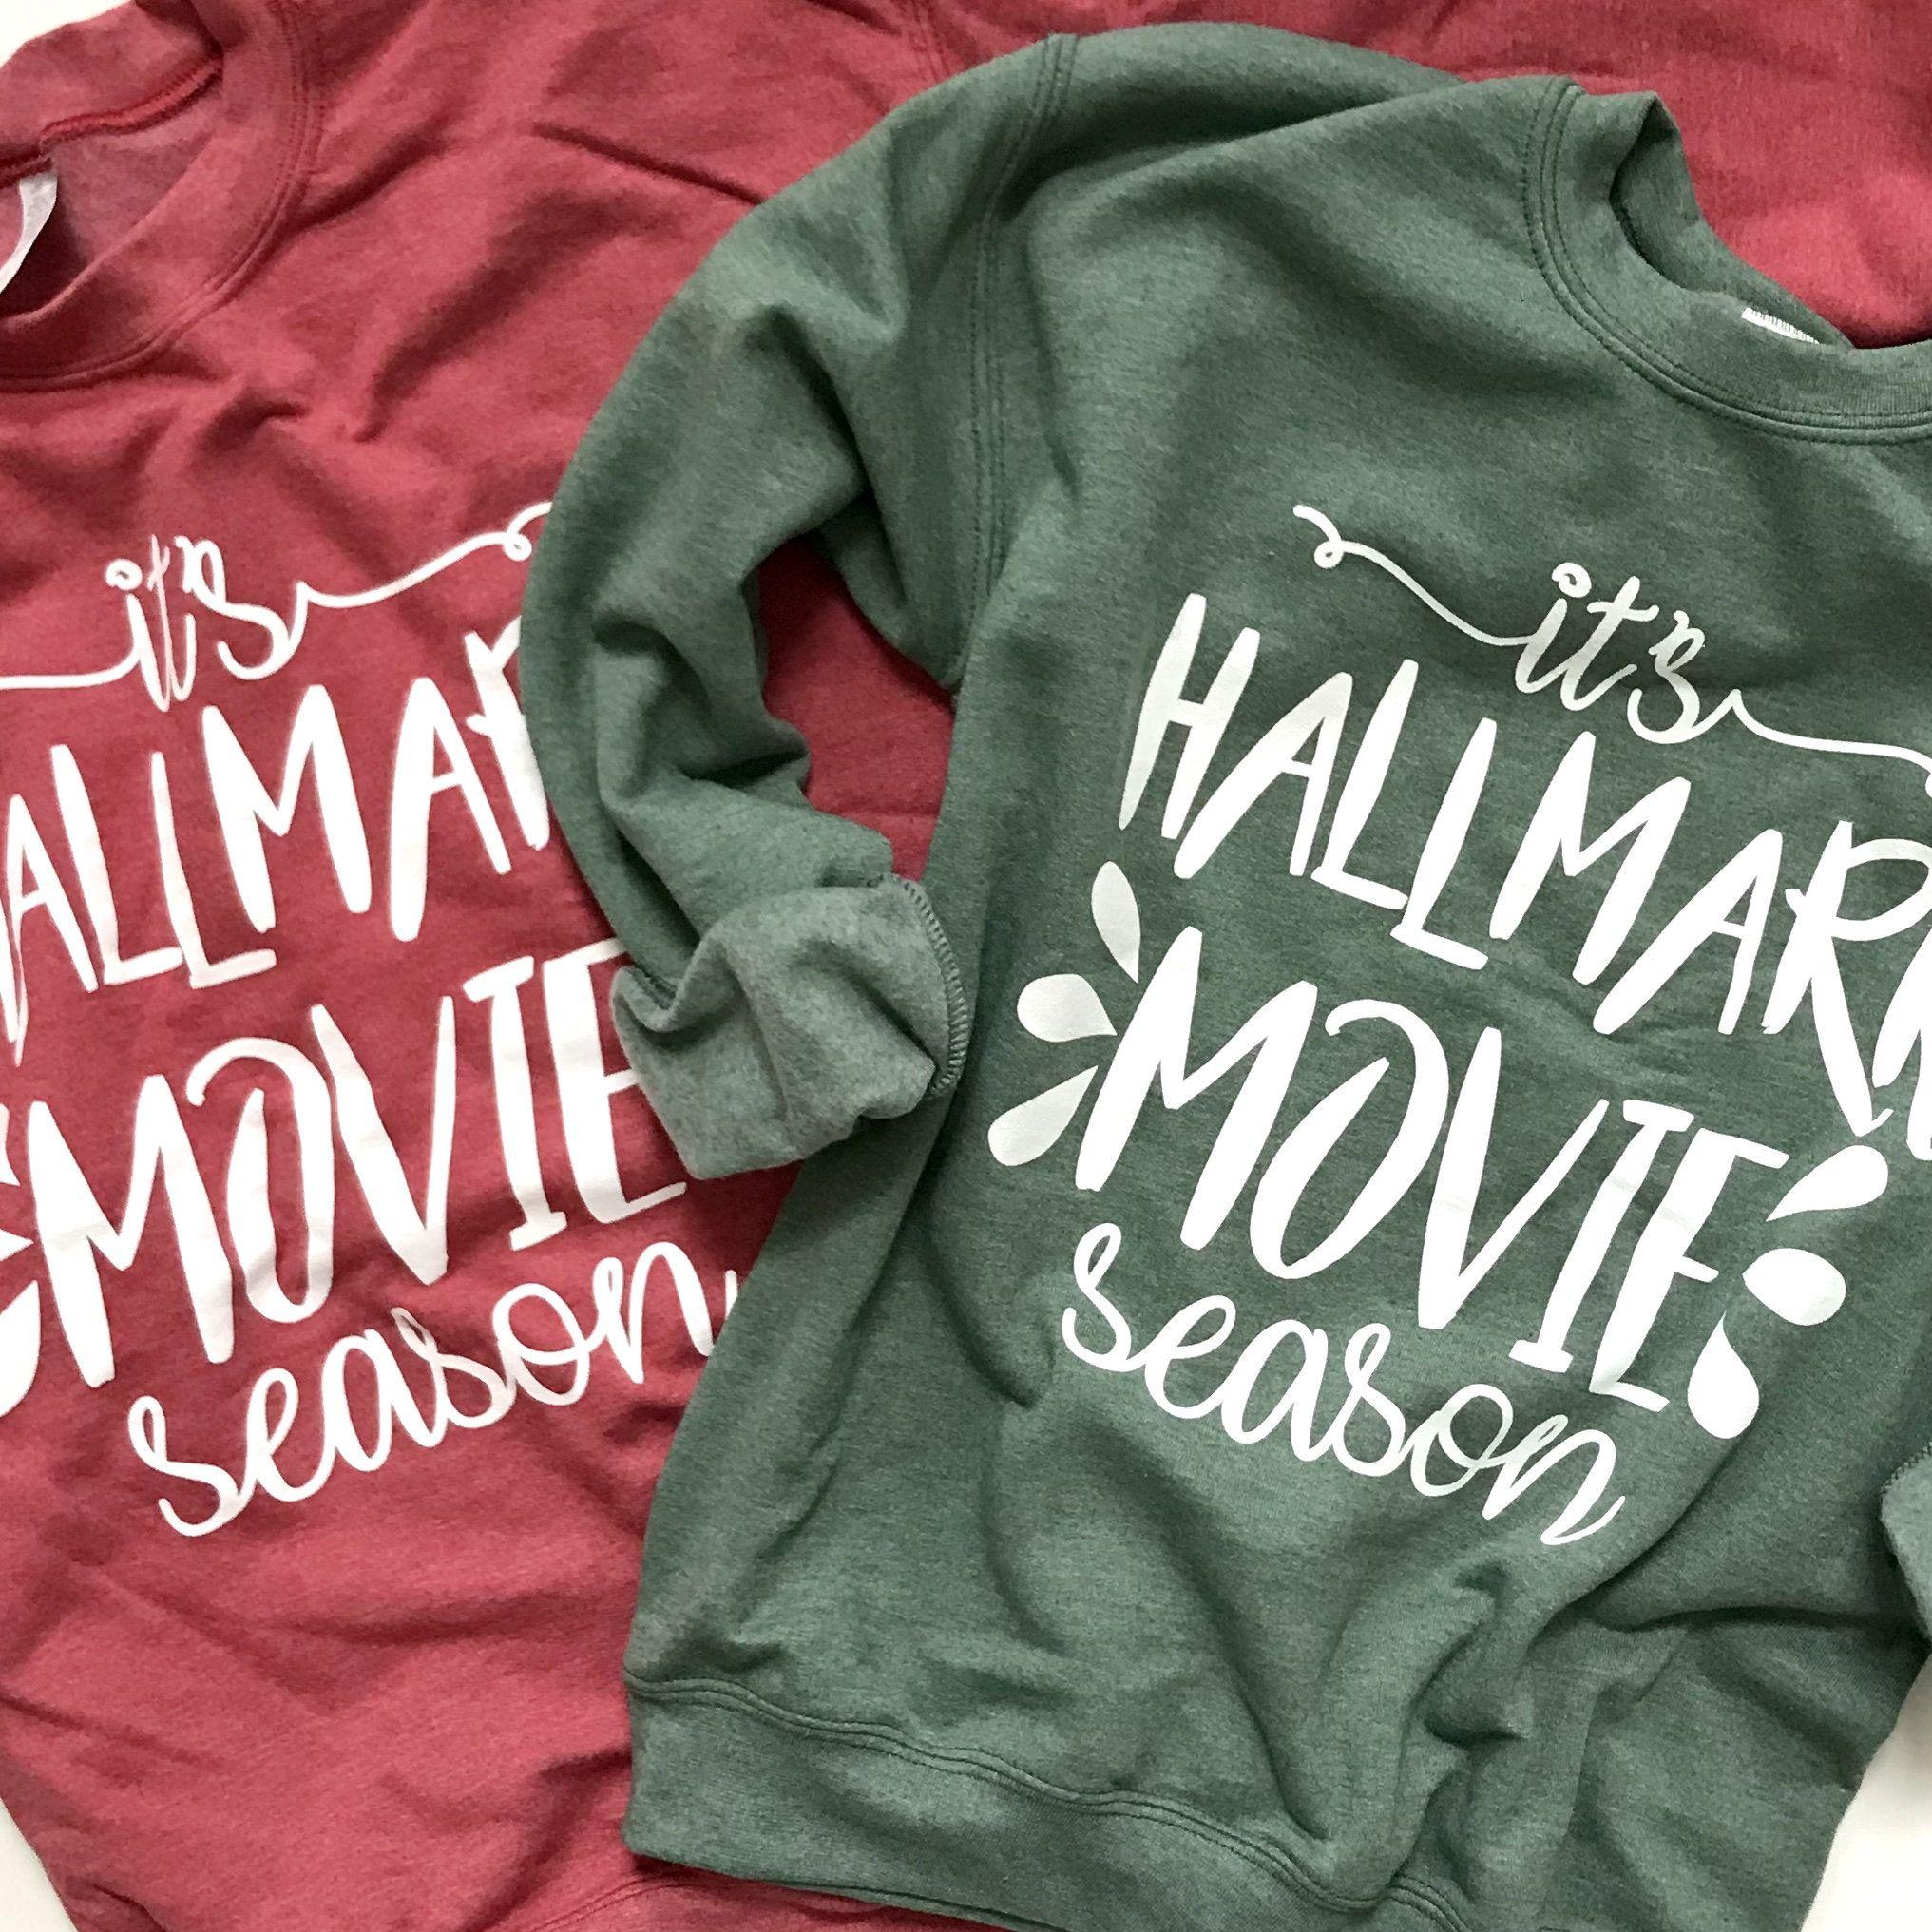 Flovey Womens This is My Christmas Movies Watching Shirt Zip Sweatshirt Fall Shirt for Women